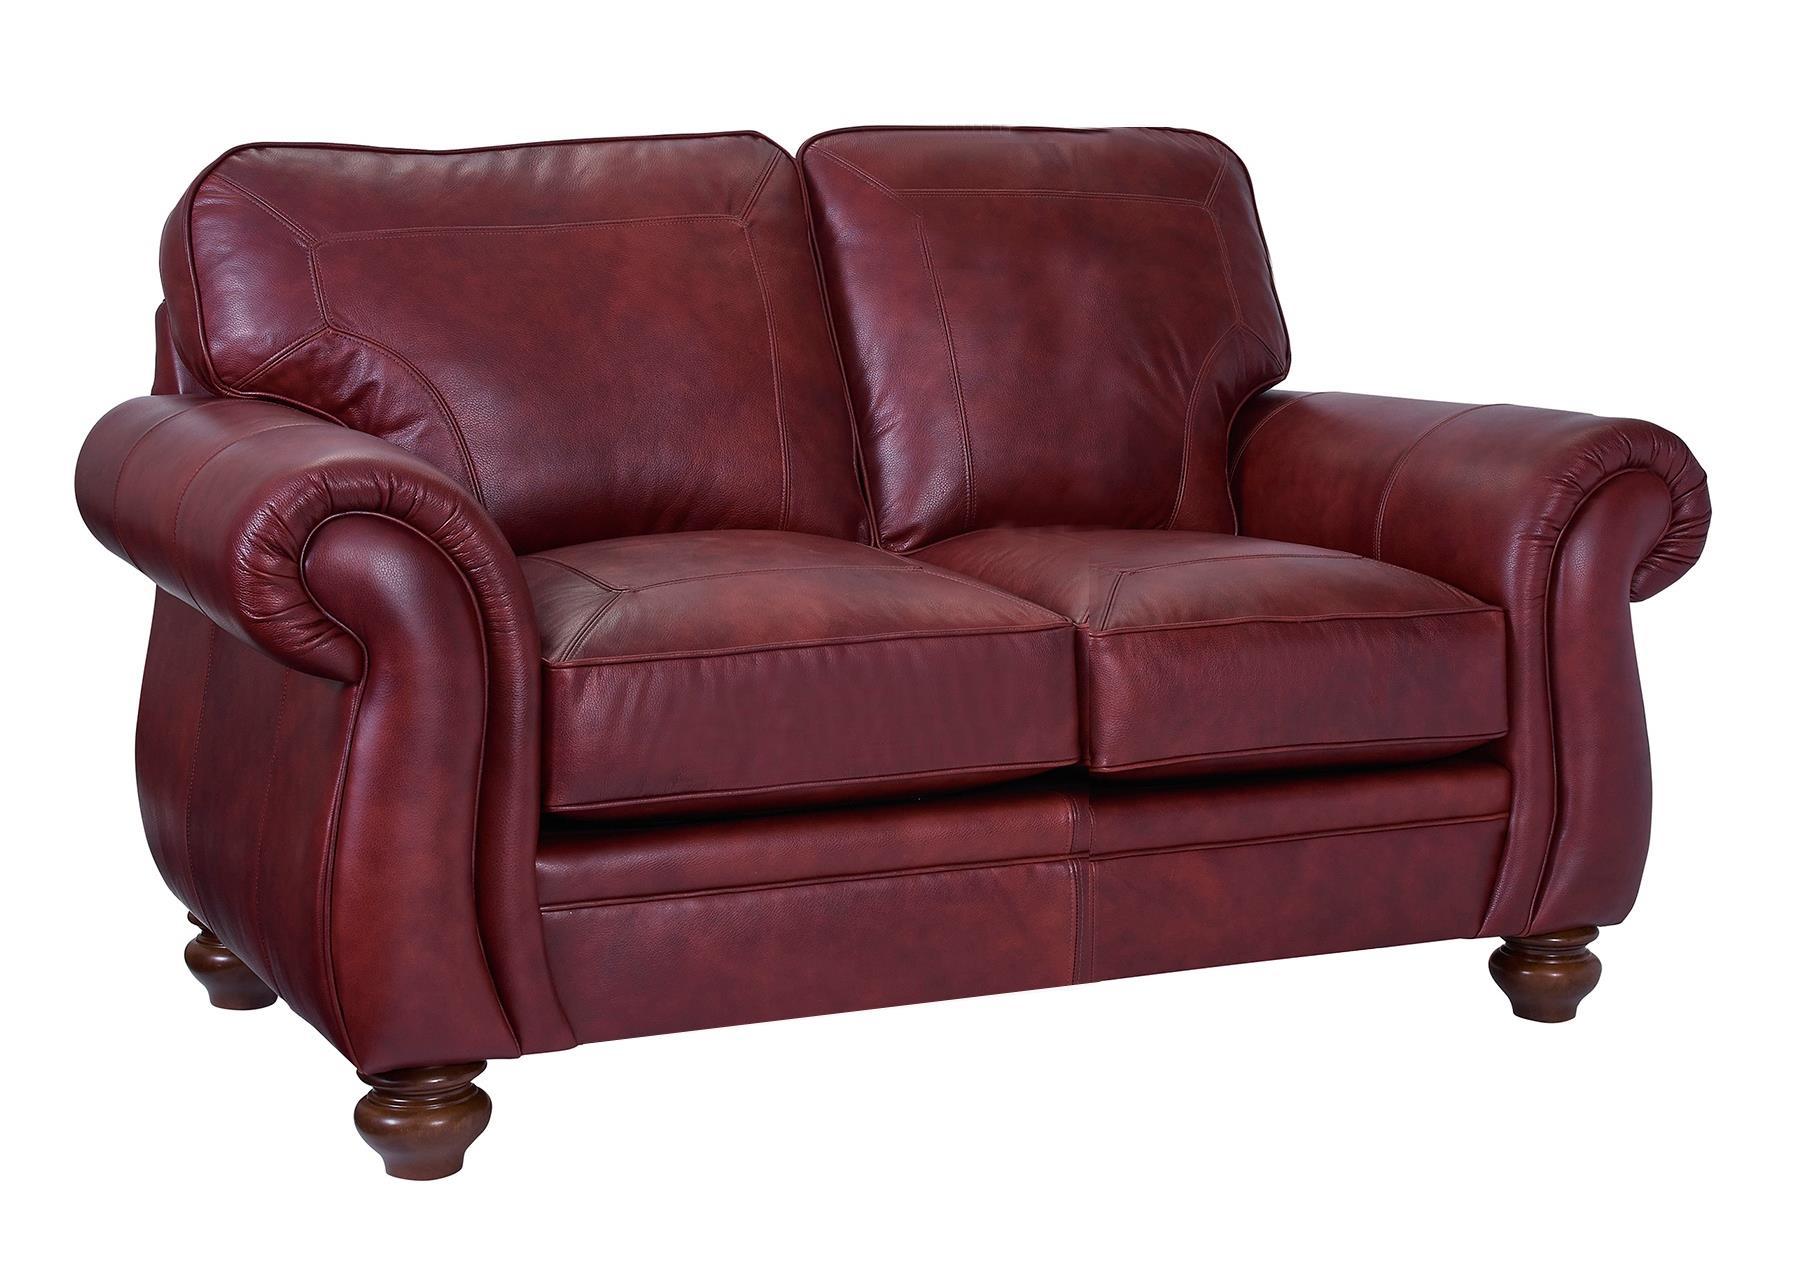 Broyhill Furniture Cassandra Traditional Loveseat - Item Number: L3688-1-0063-69